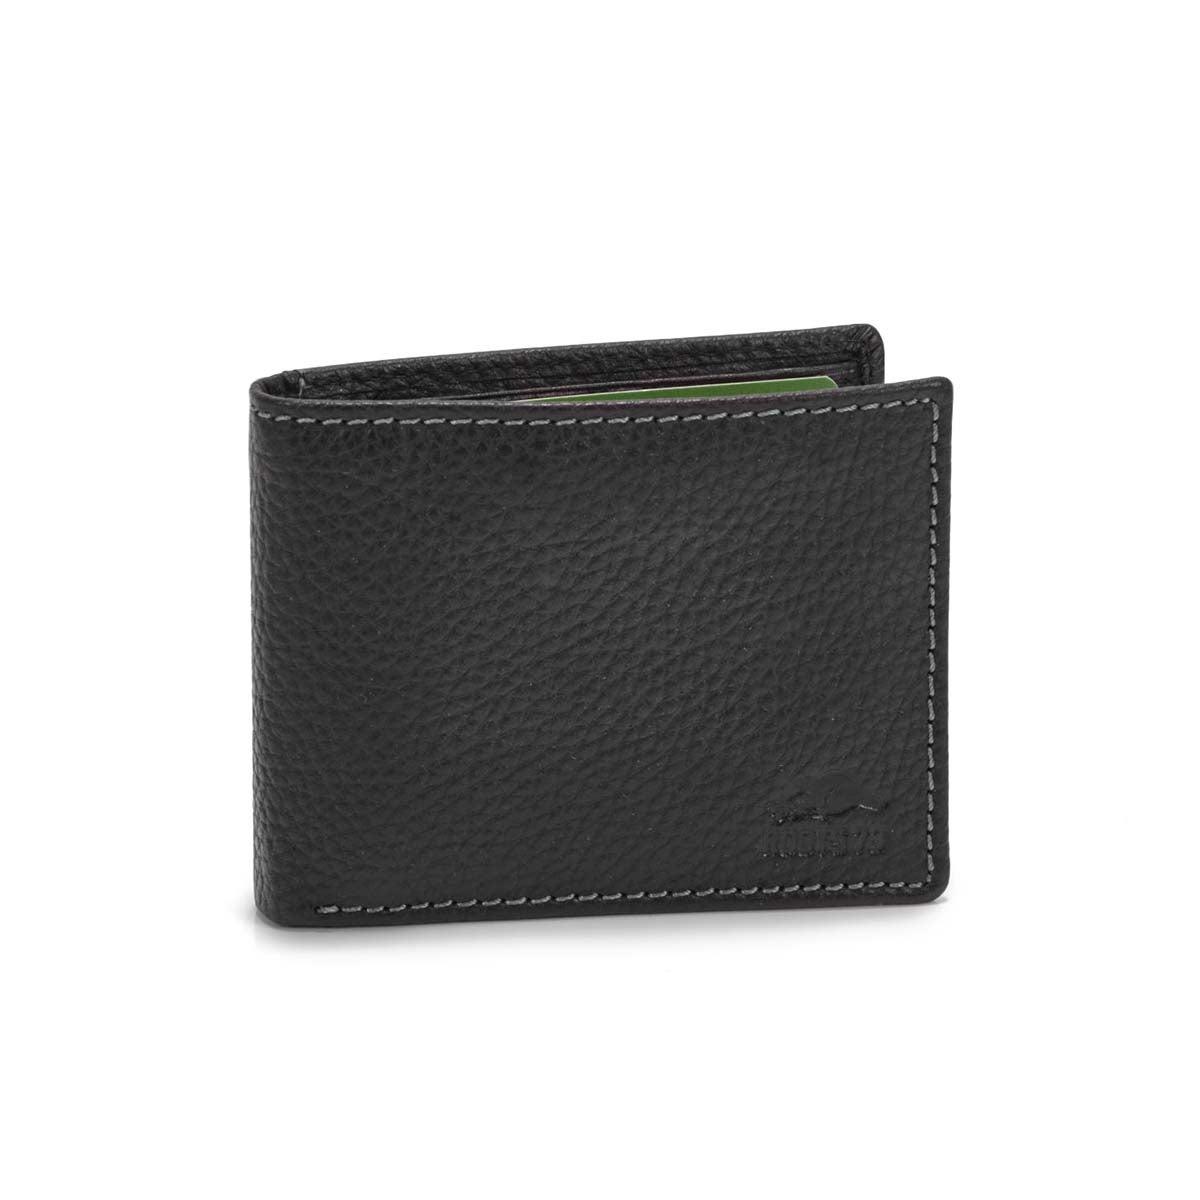 Men's MARINE black slimfold wallet